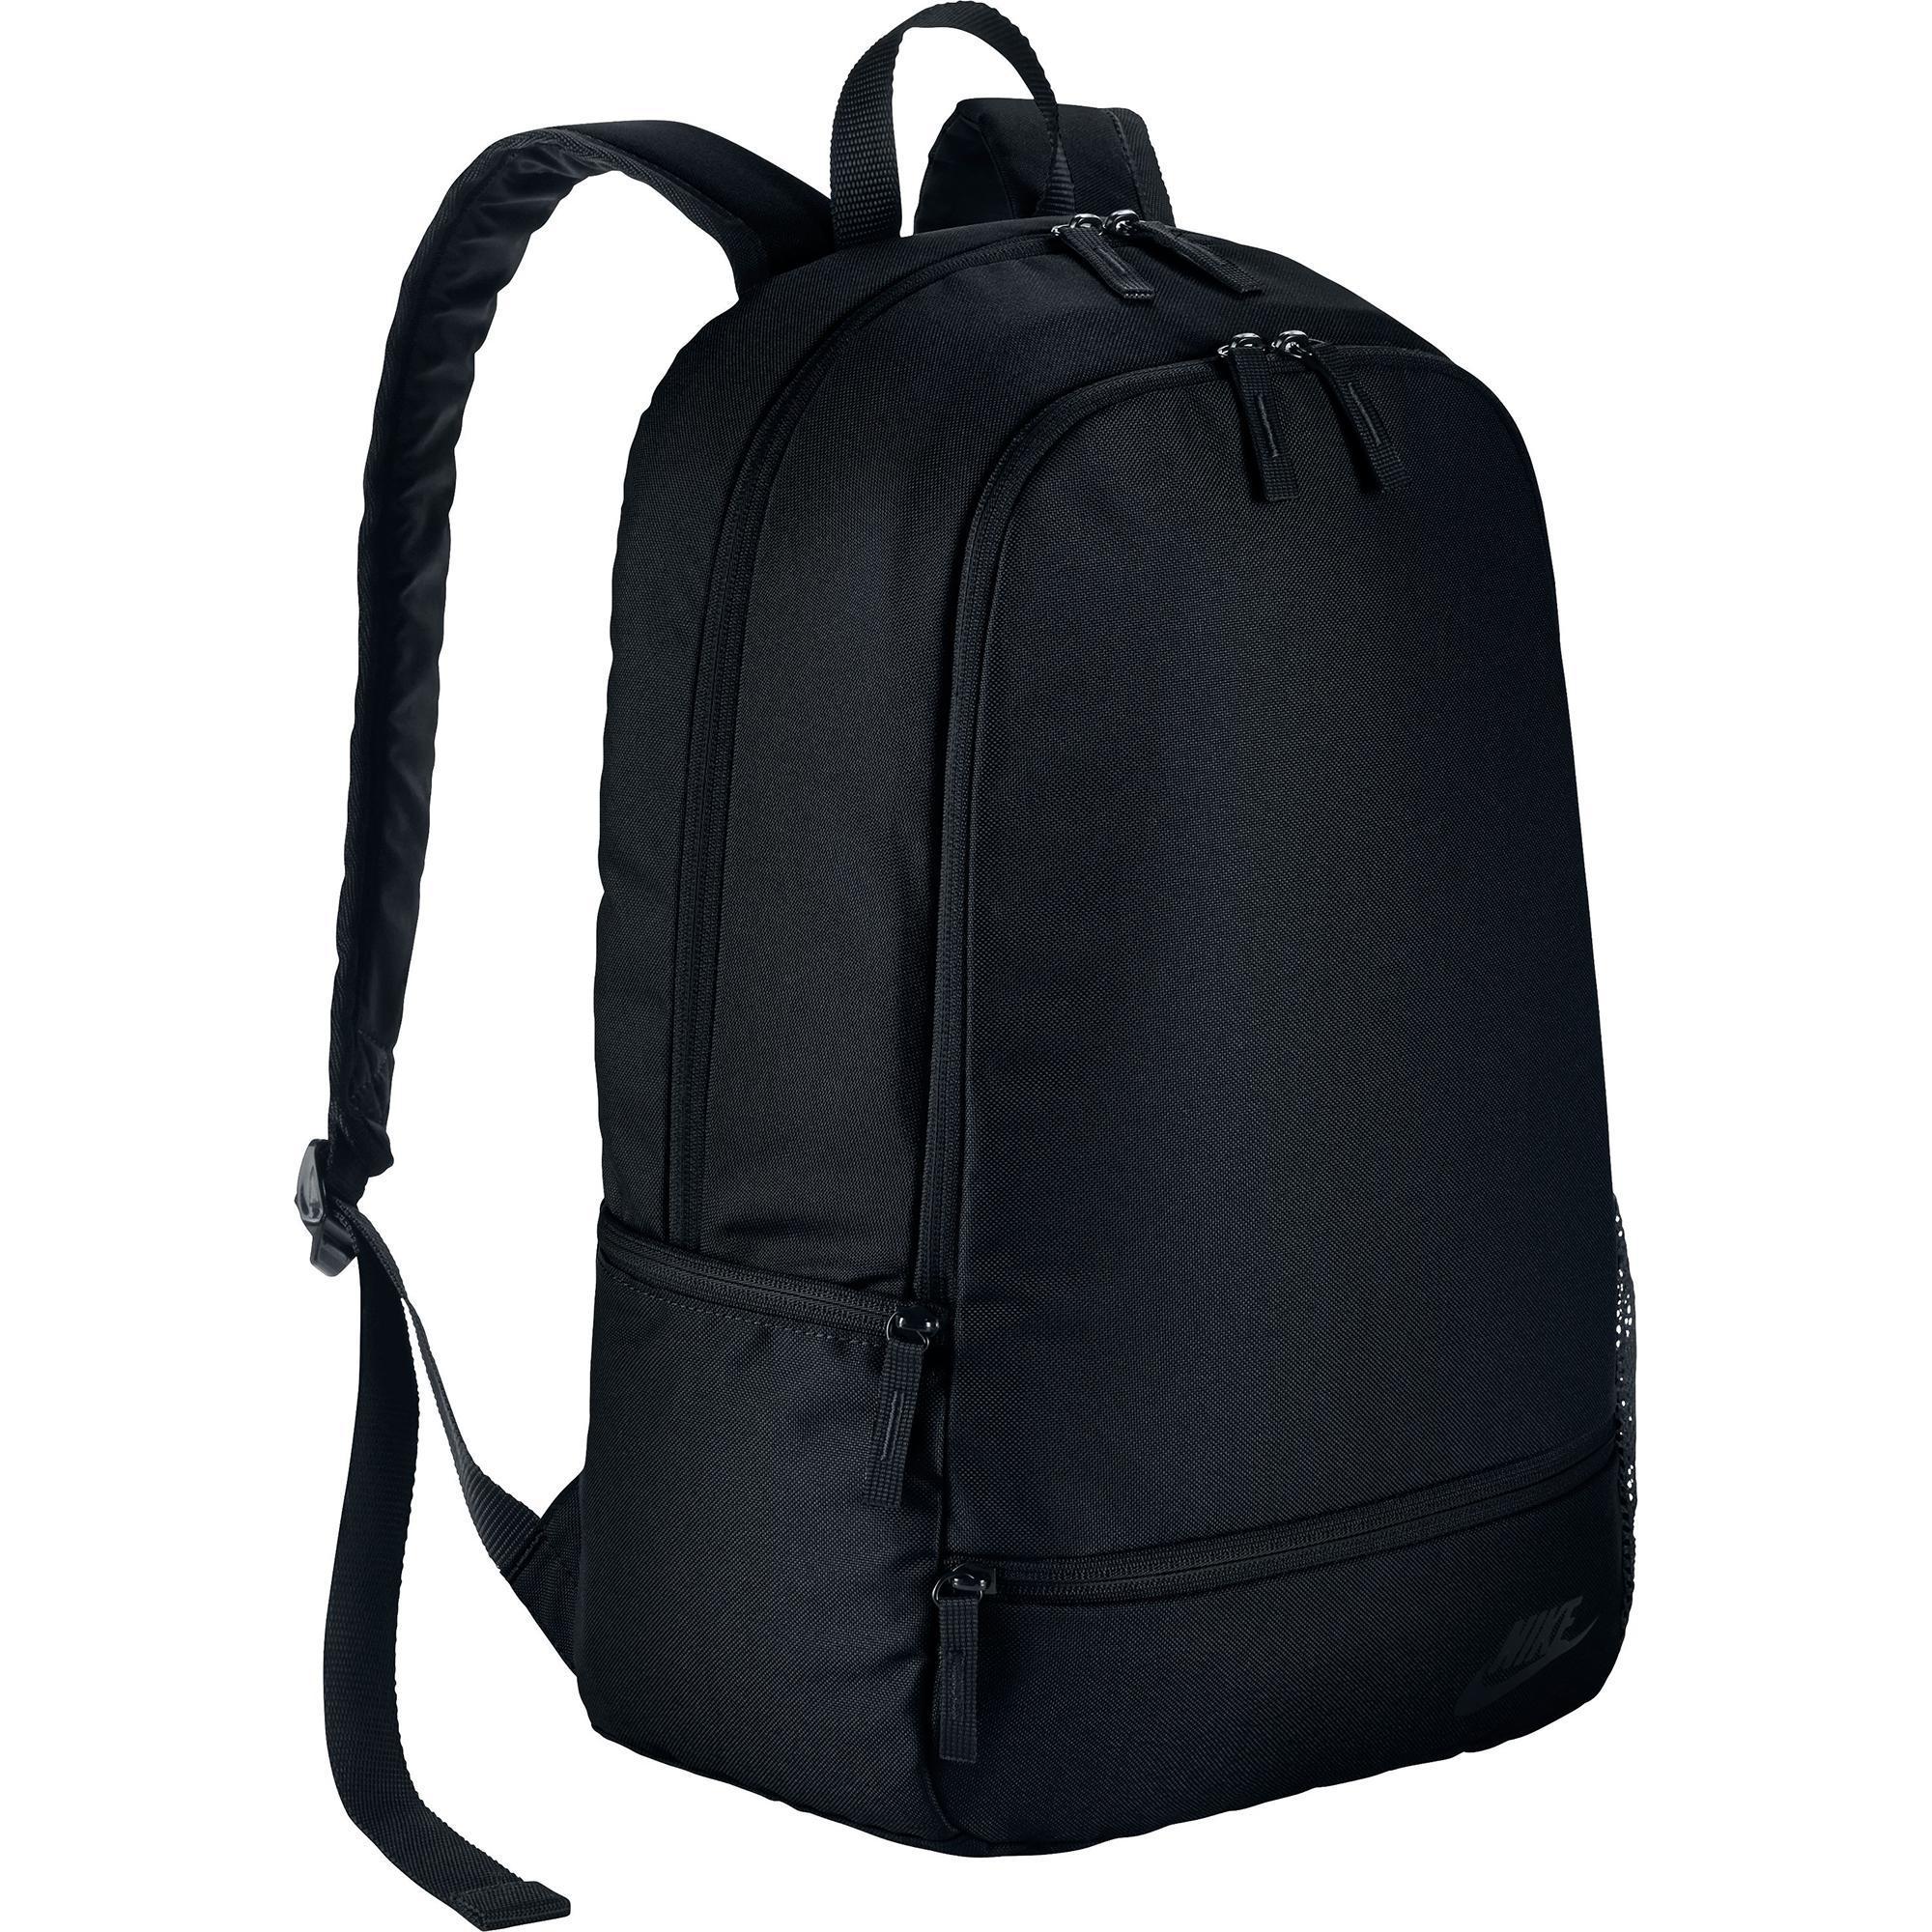 Nike Classic North Solid Backpack - Black - Tennisnuts.com